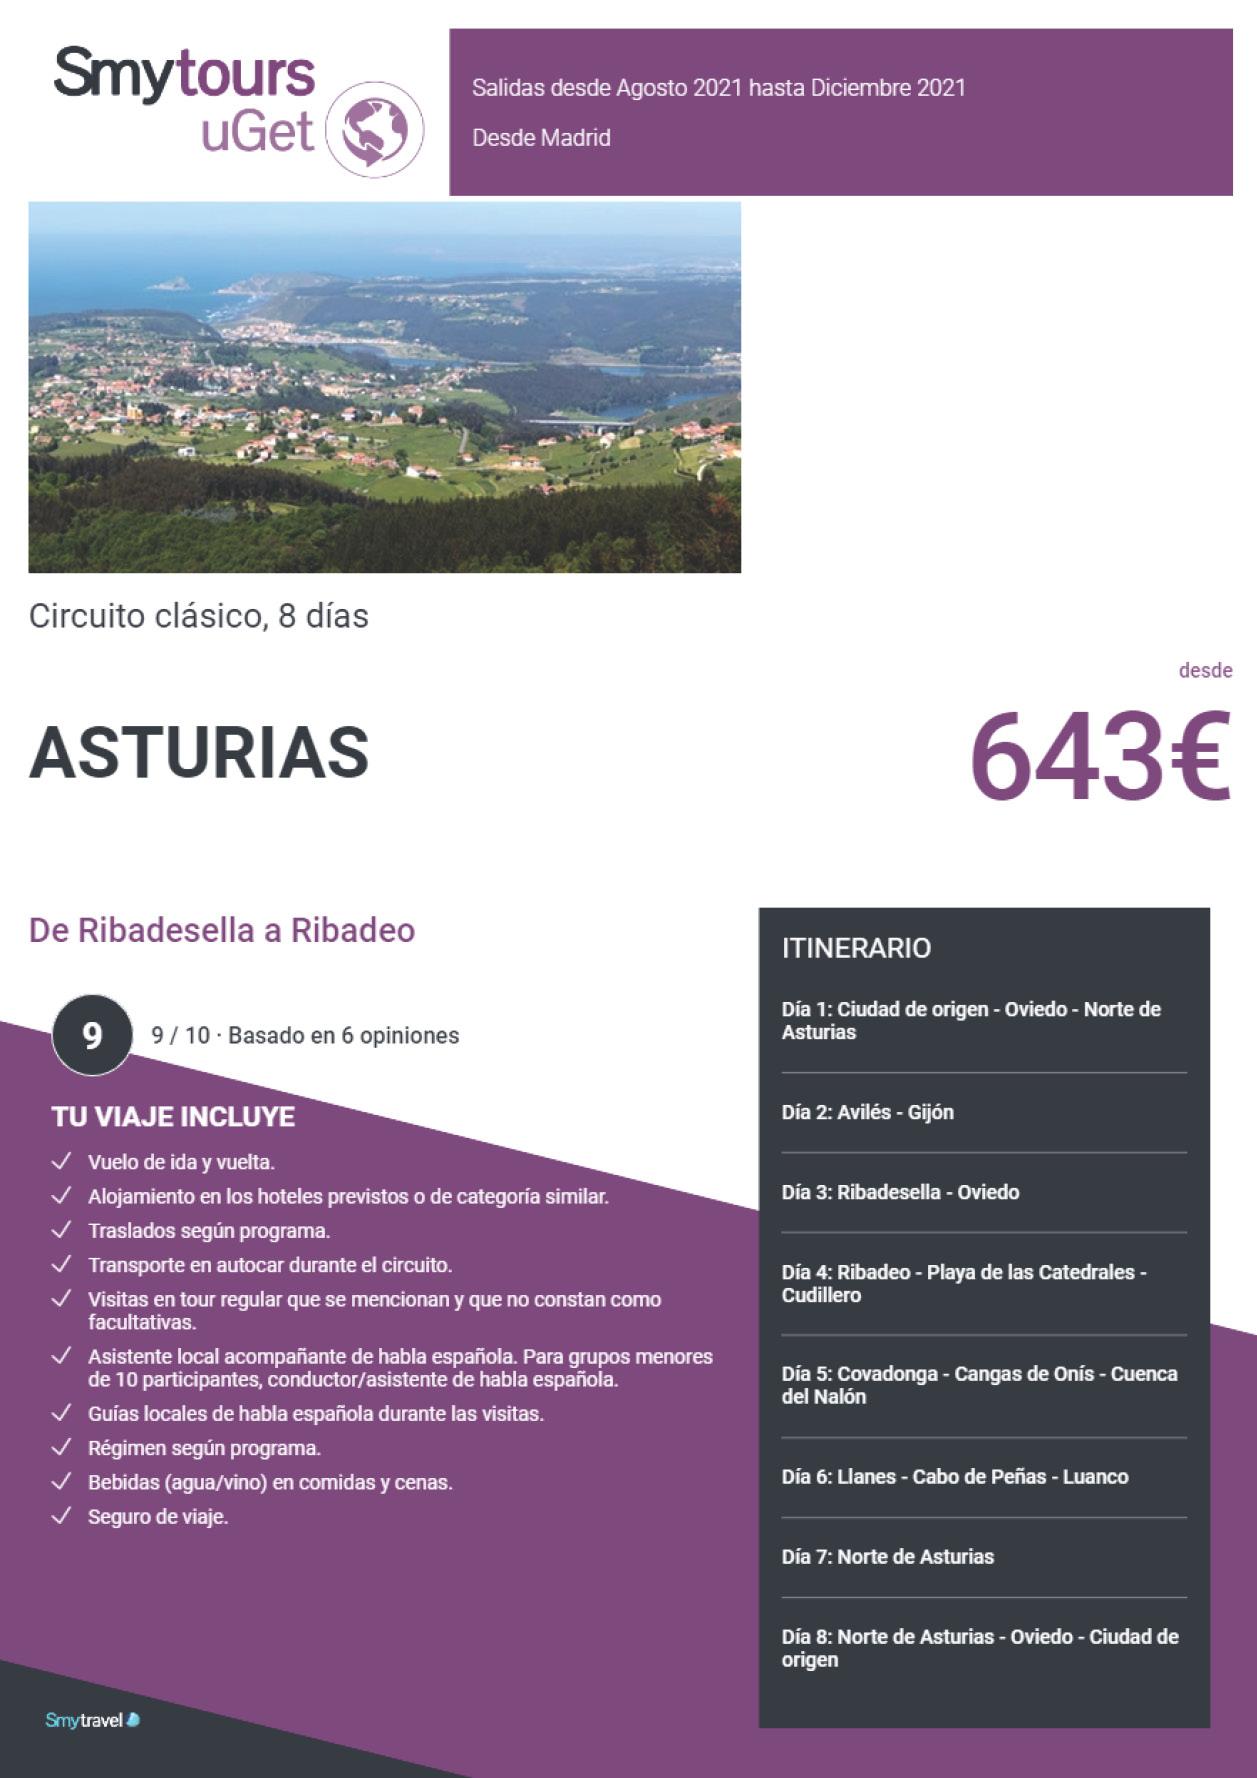 Oferta Smytravel Circuito de Ribadeo a Ribadesella 8 dias salidas Madrid desde 643 €